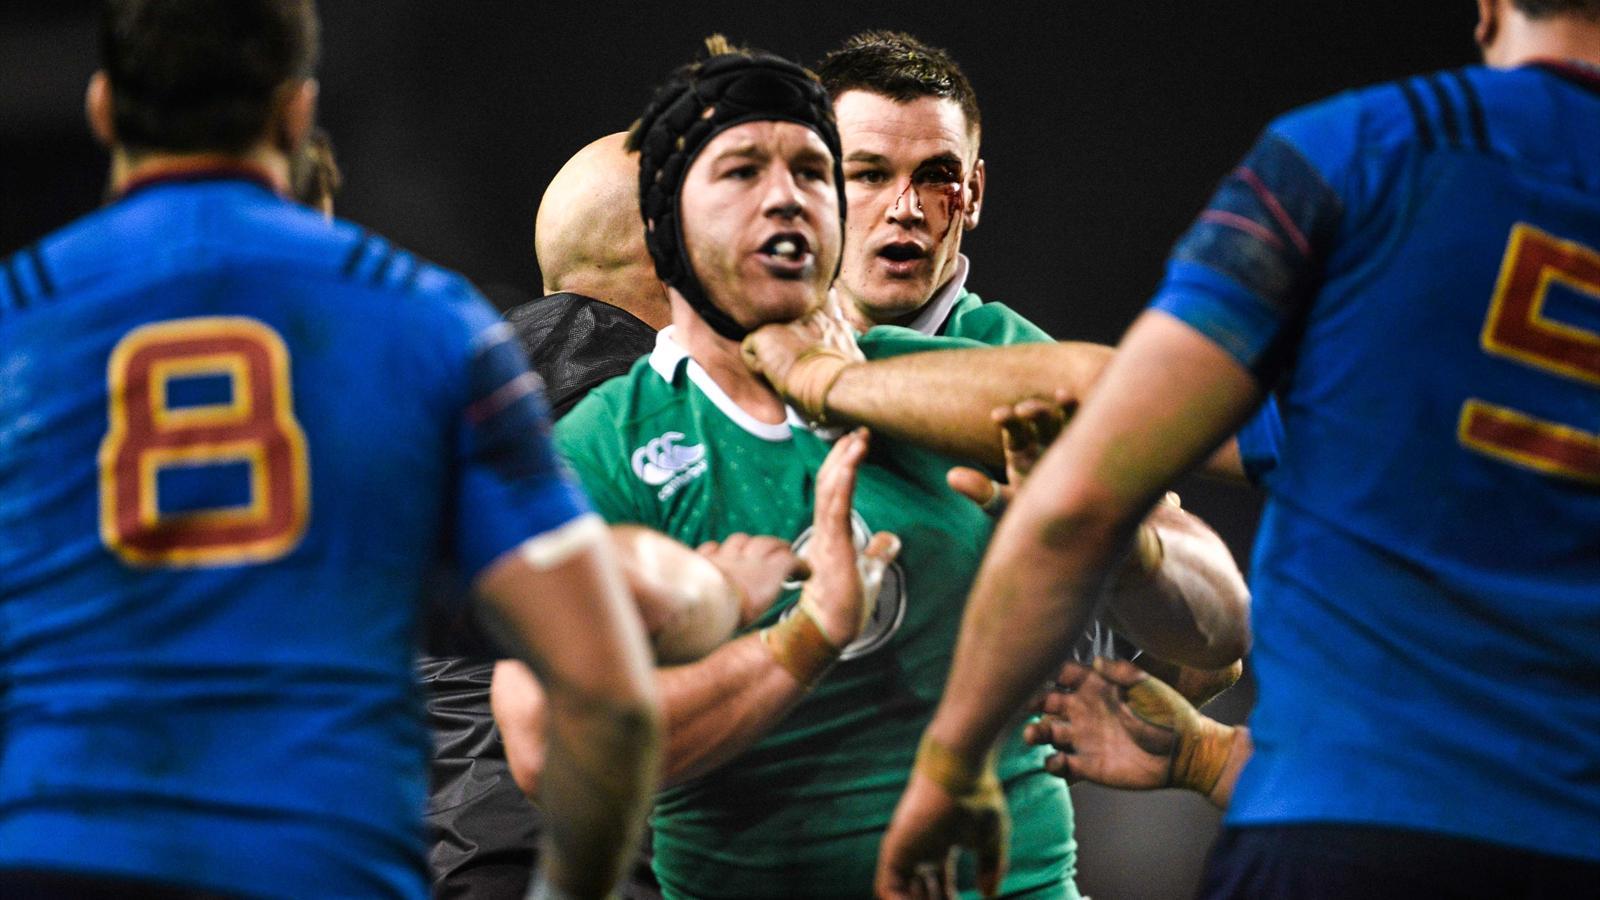 Sean O'Brien. Irlande-France, 14 février 2015